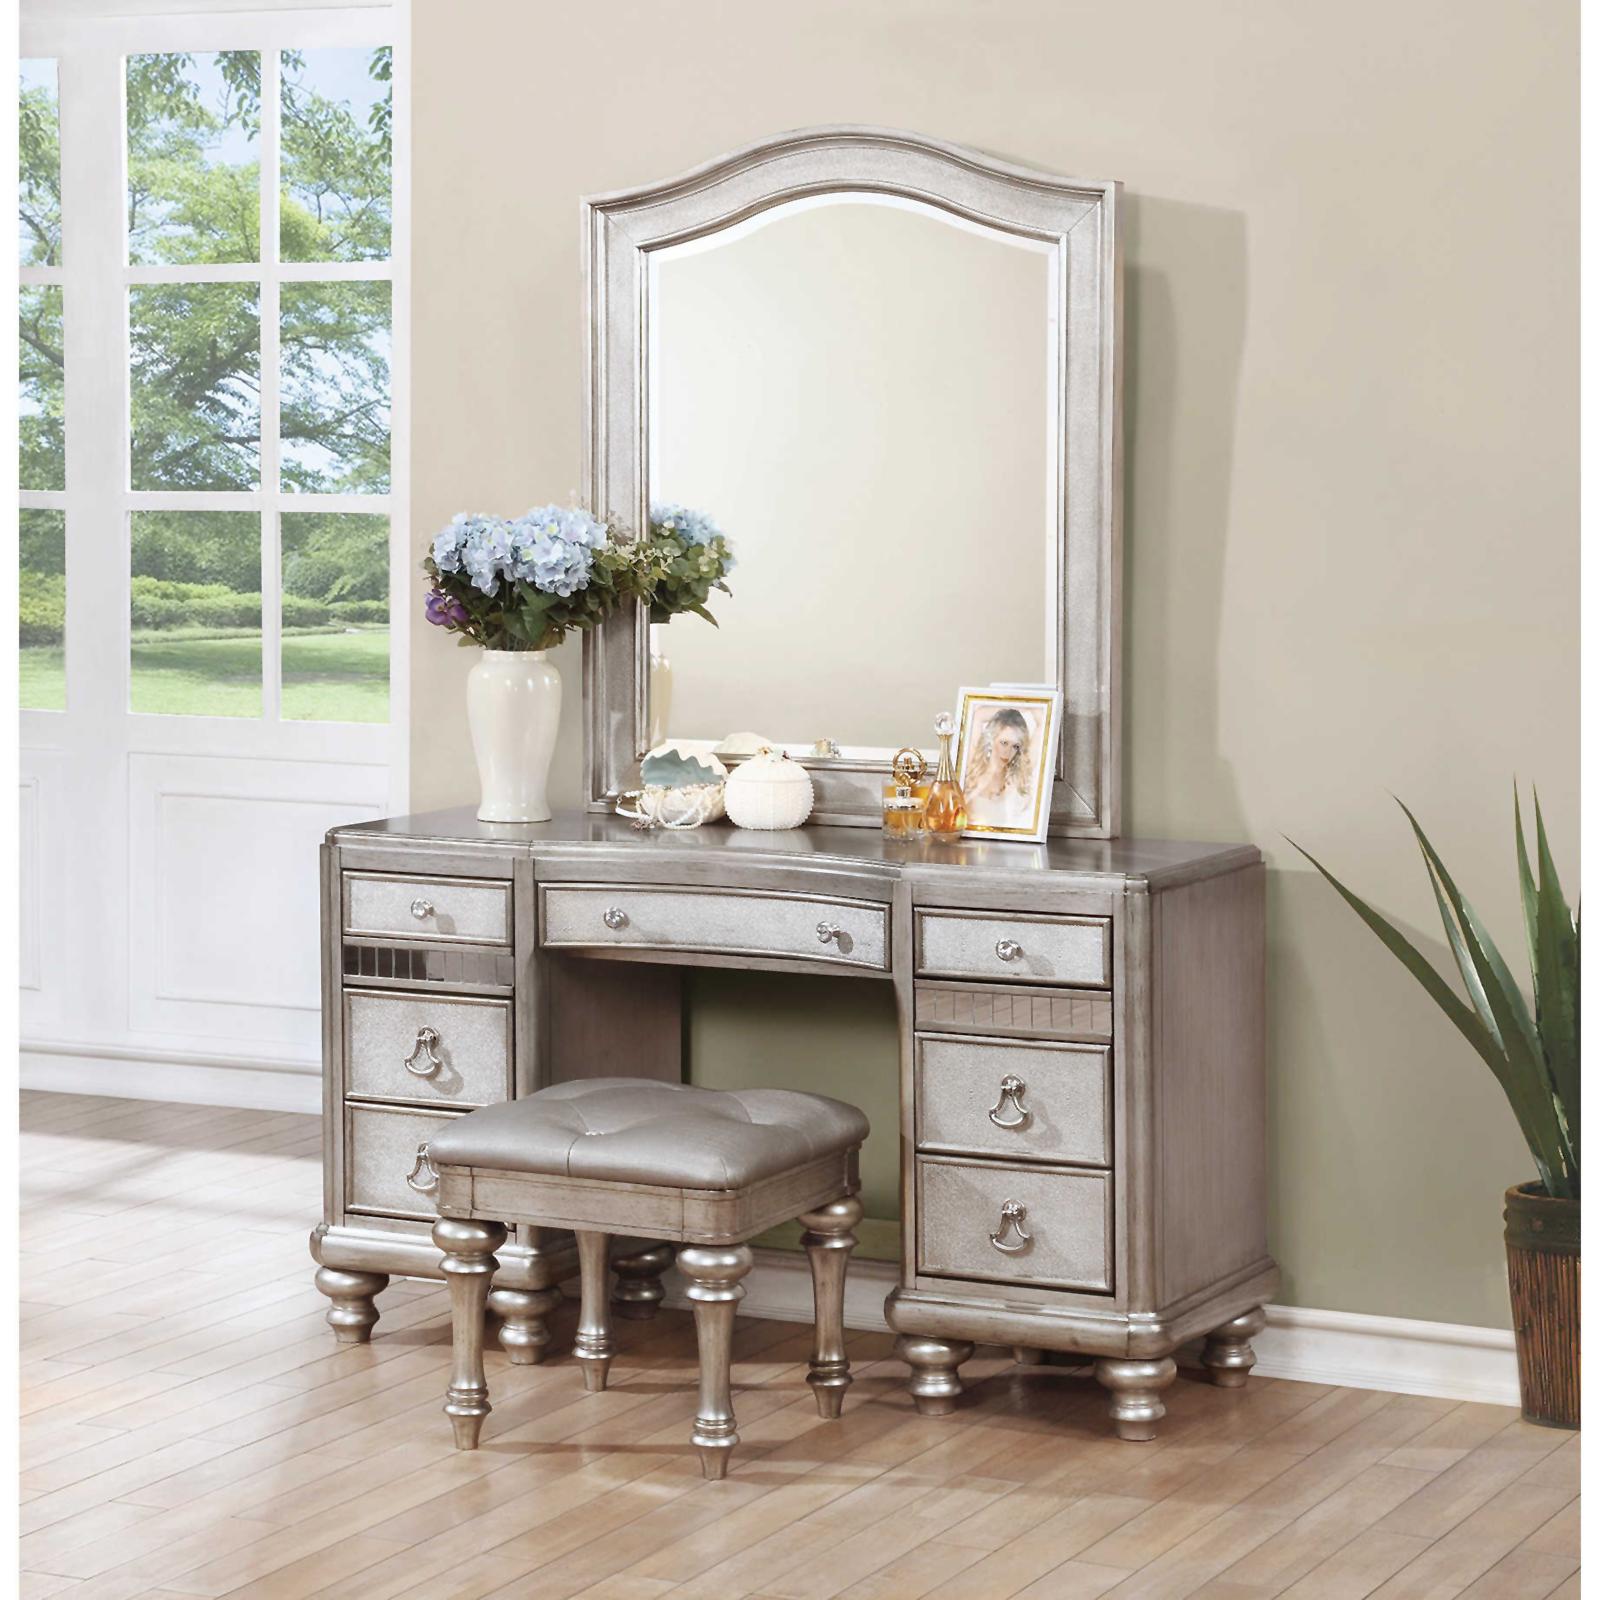 Coaster Furniture Company of America Vanity Table - Sears Marketplace